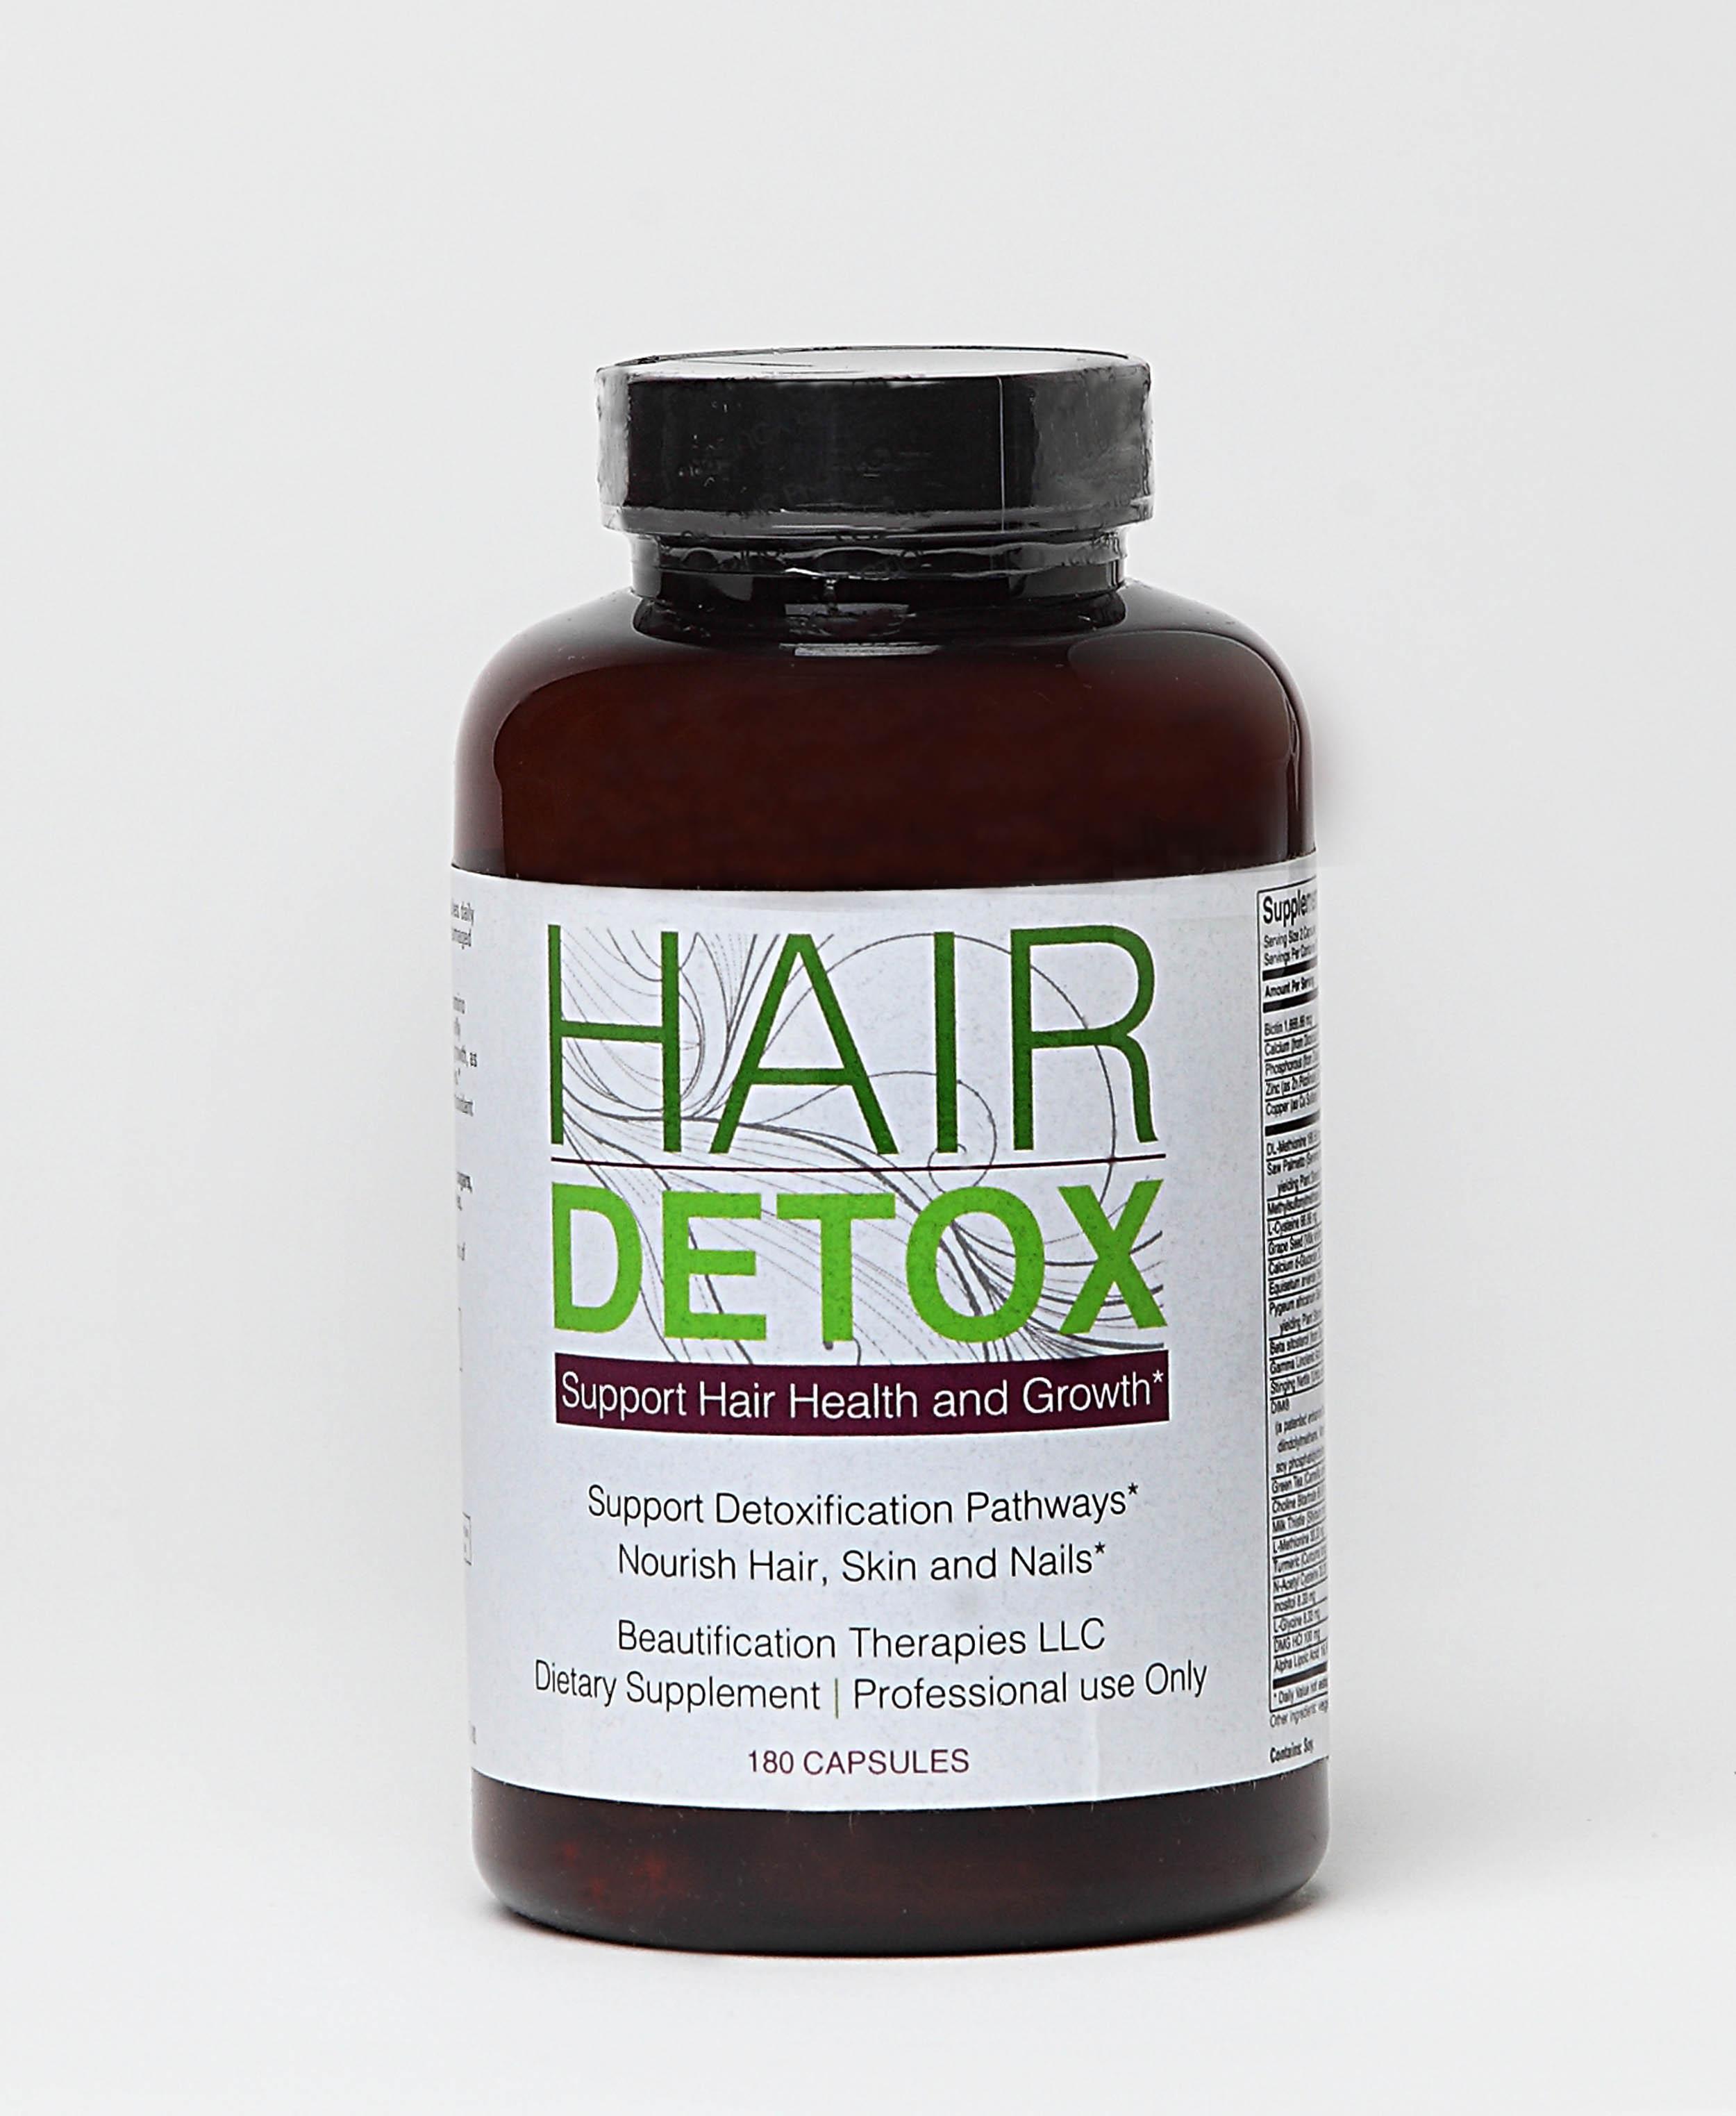 angelo-david-salon-hair-detox-grungecake-thumbnail